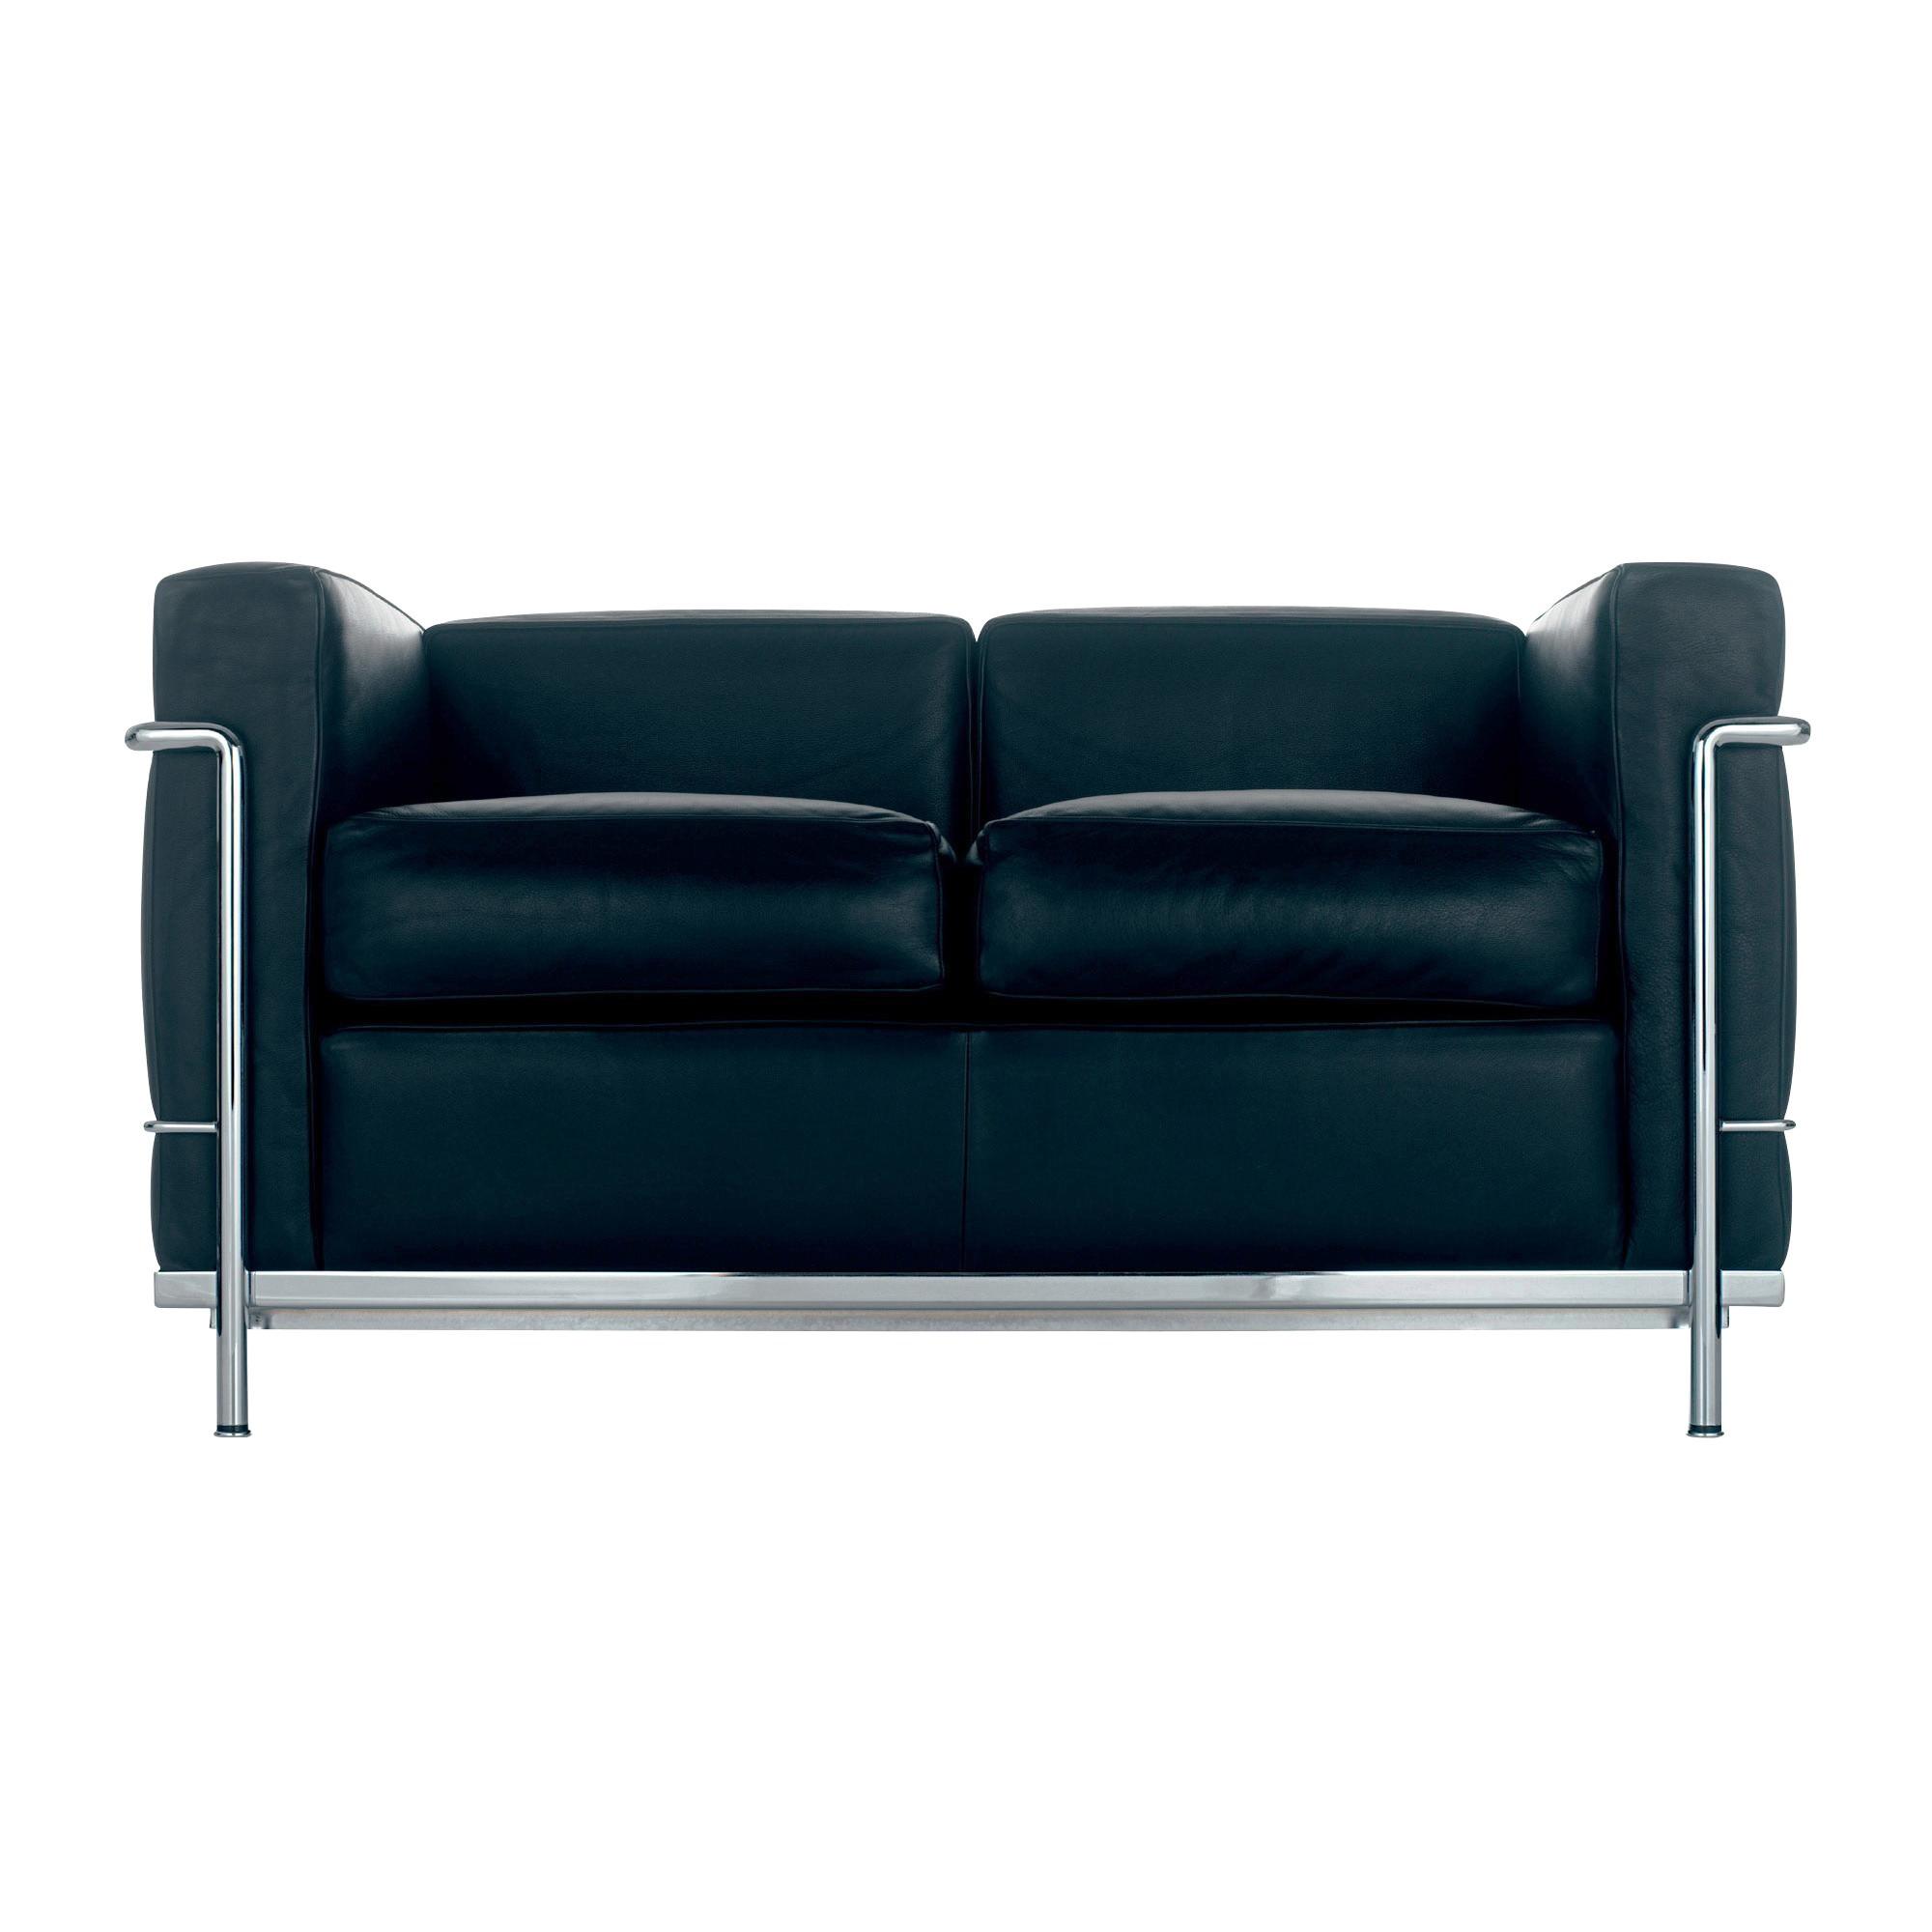 Full Size of Cassina Sofa Le Corbusier Lc2 Two Seater Ambientedirect Mit Bettkasten De Sede Blaues Mega Langes Leder Braun Big Hersteller Microfaser U Form Xxl Federkern Sofa Cassina Sofa